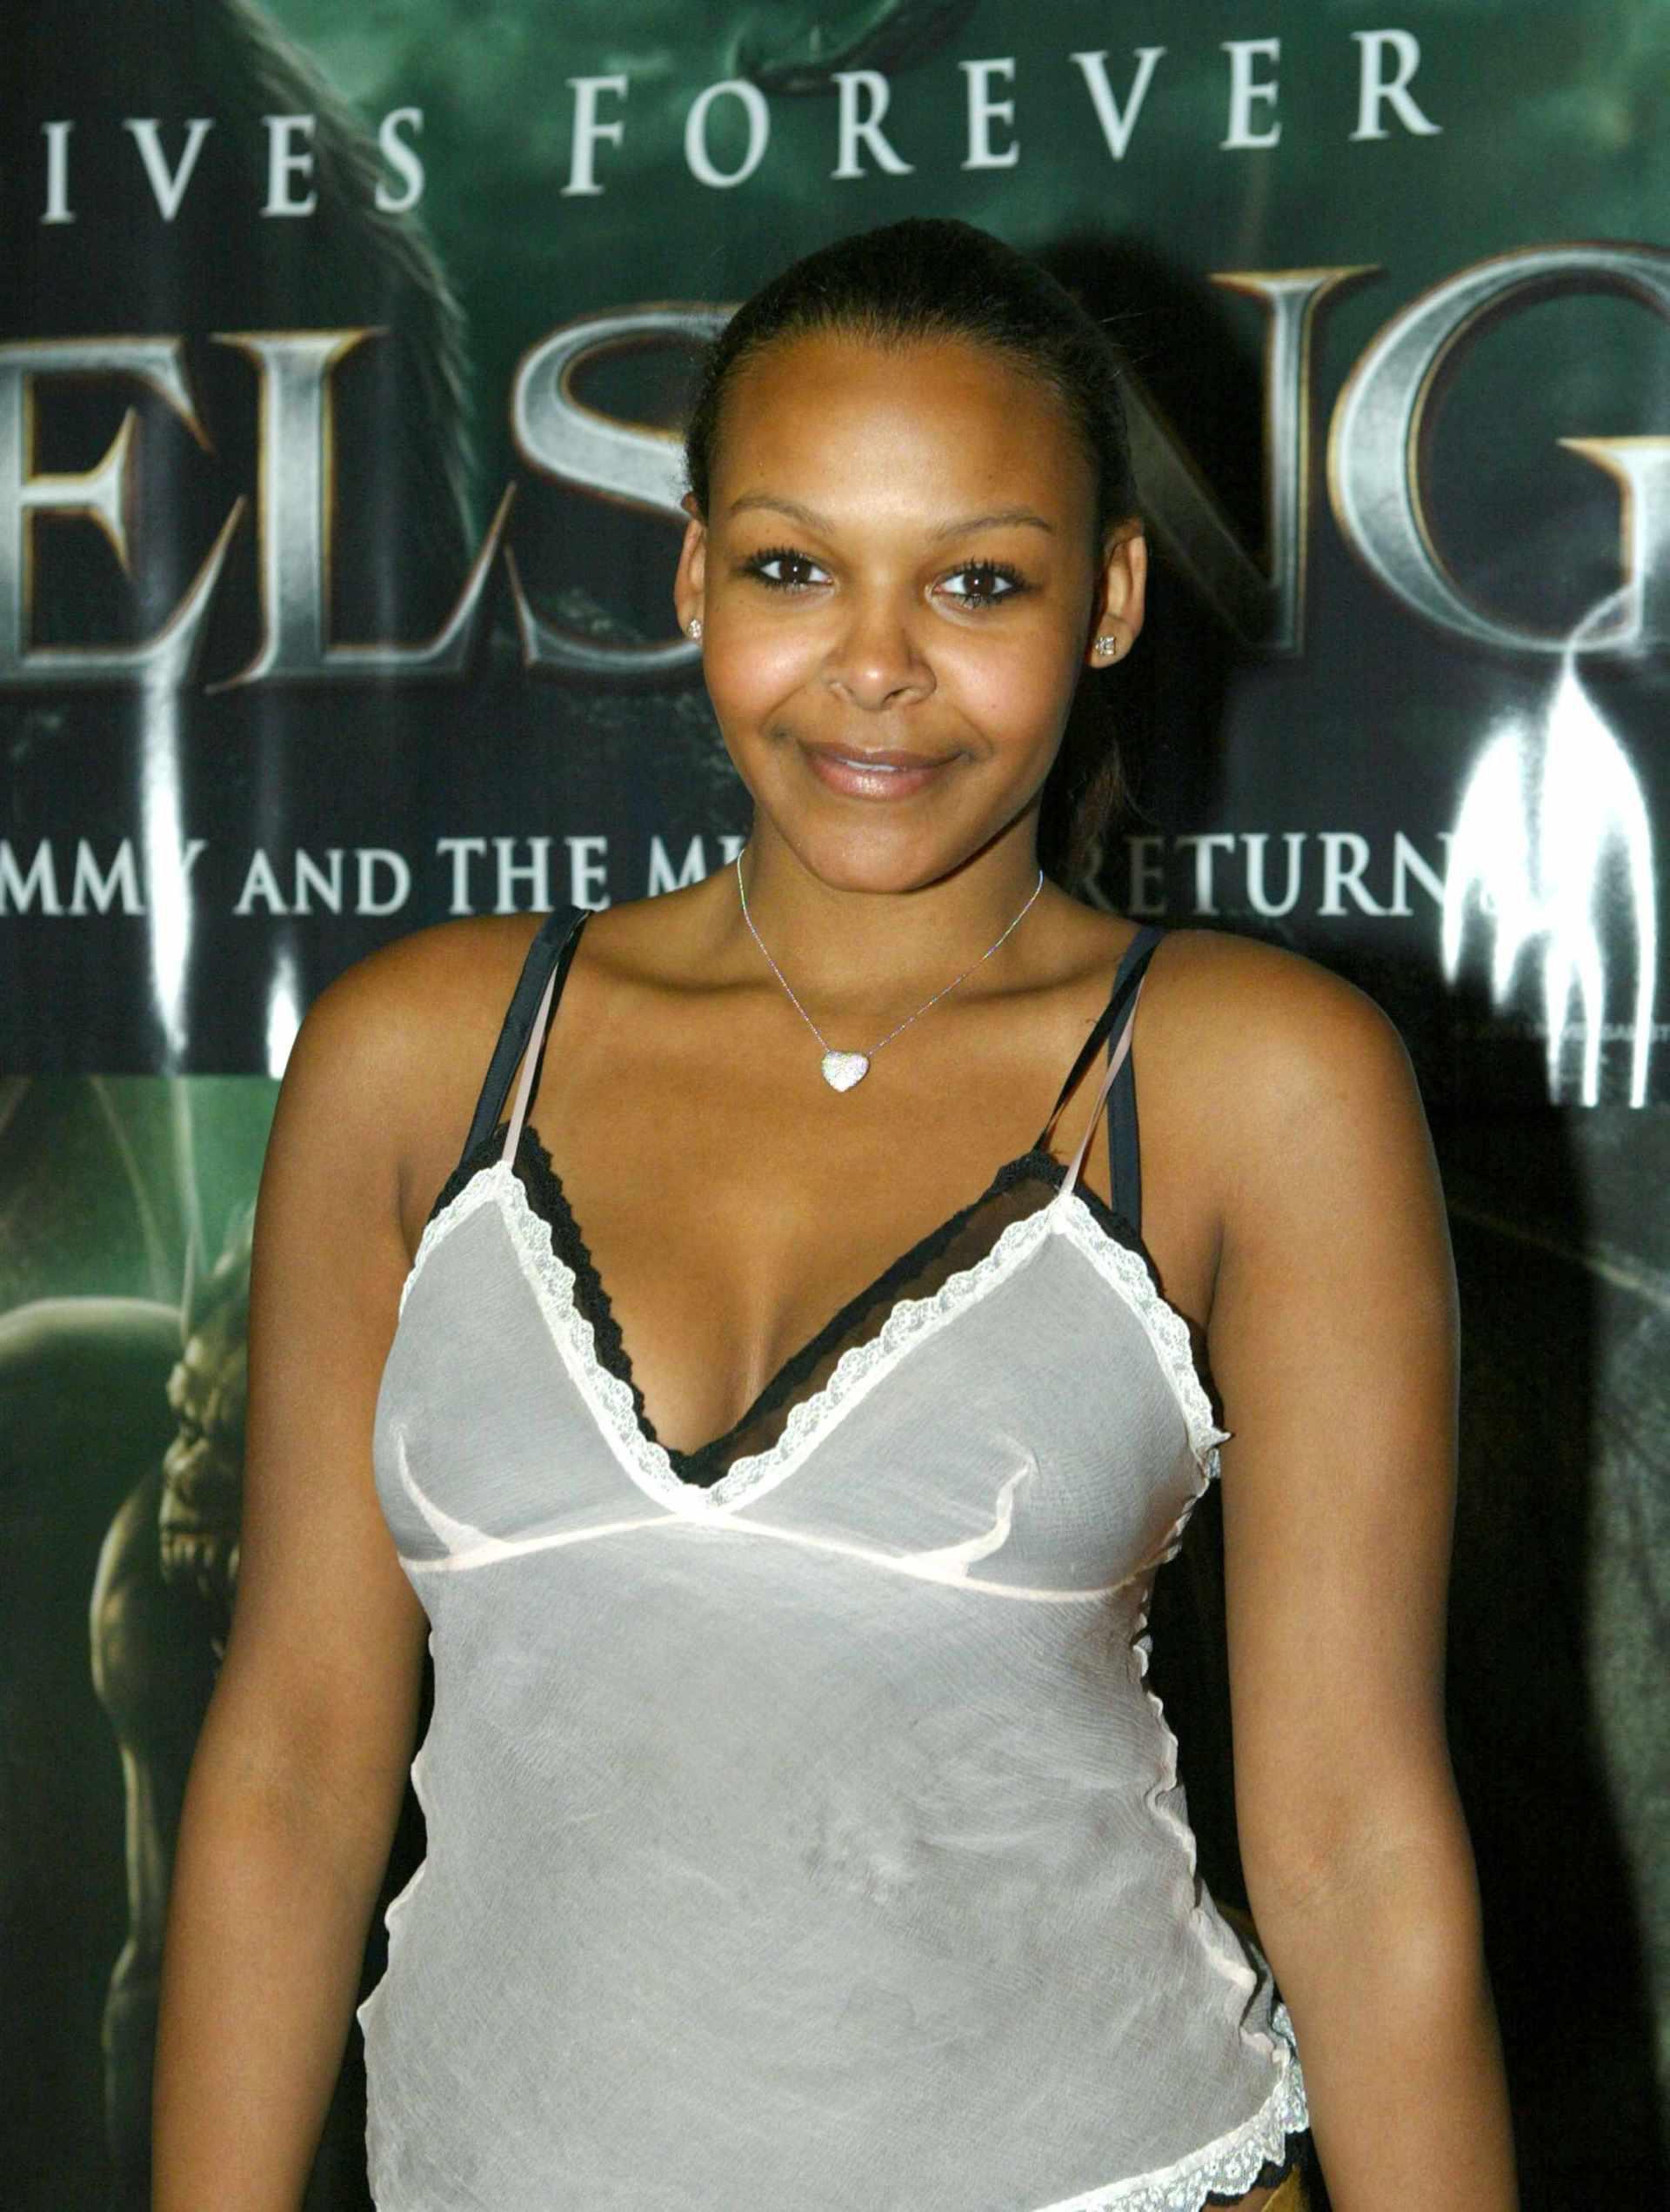 Nackt  Samantha Mumba Nudity in